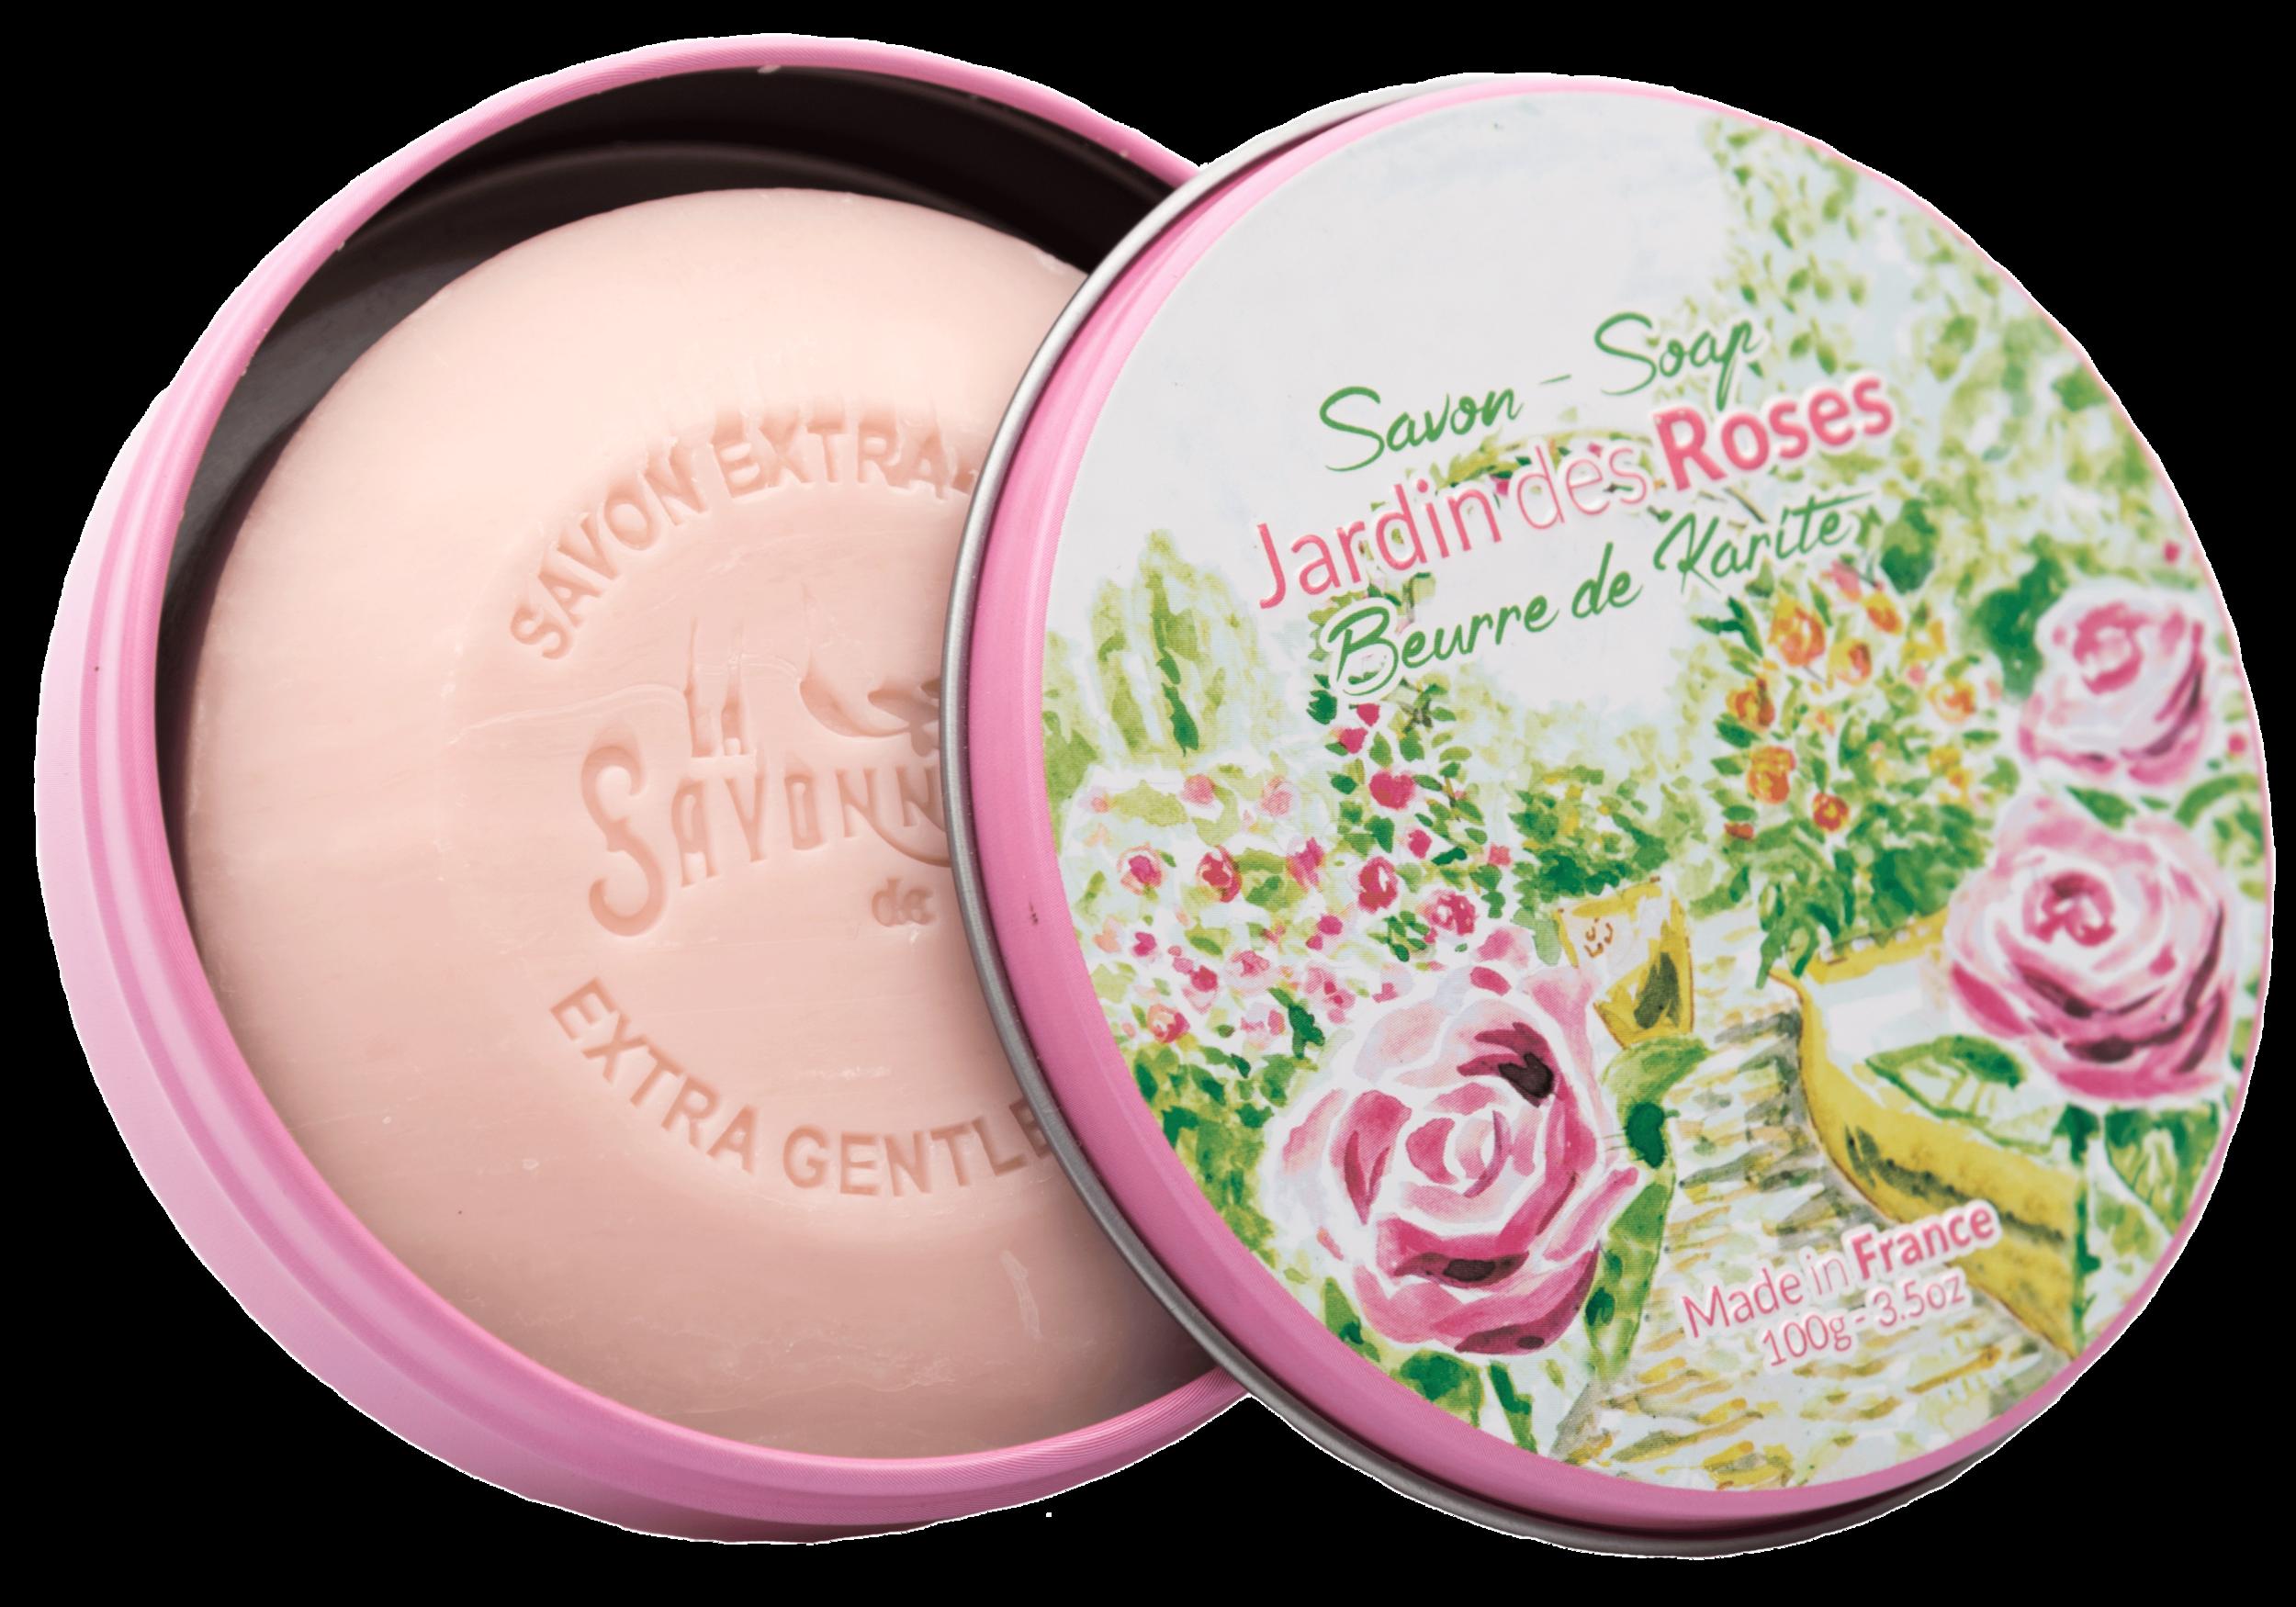 Boite Métal Ronde & Savon 100 g Jardin des Roses